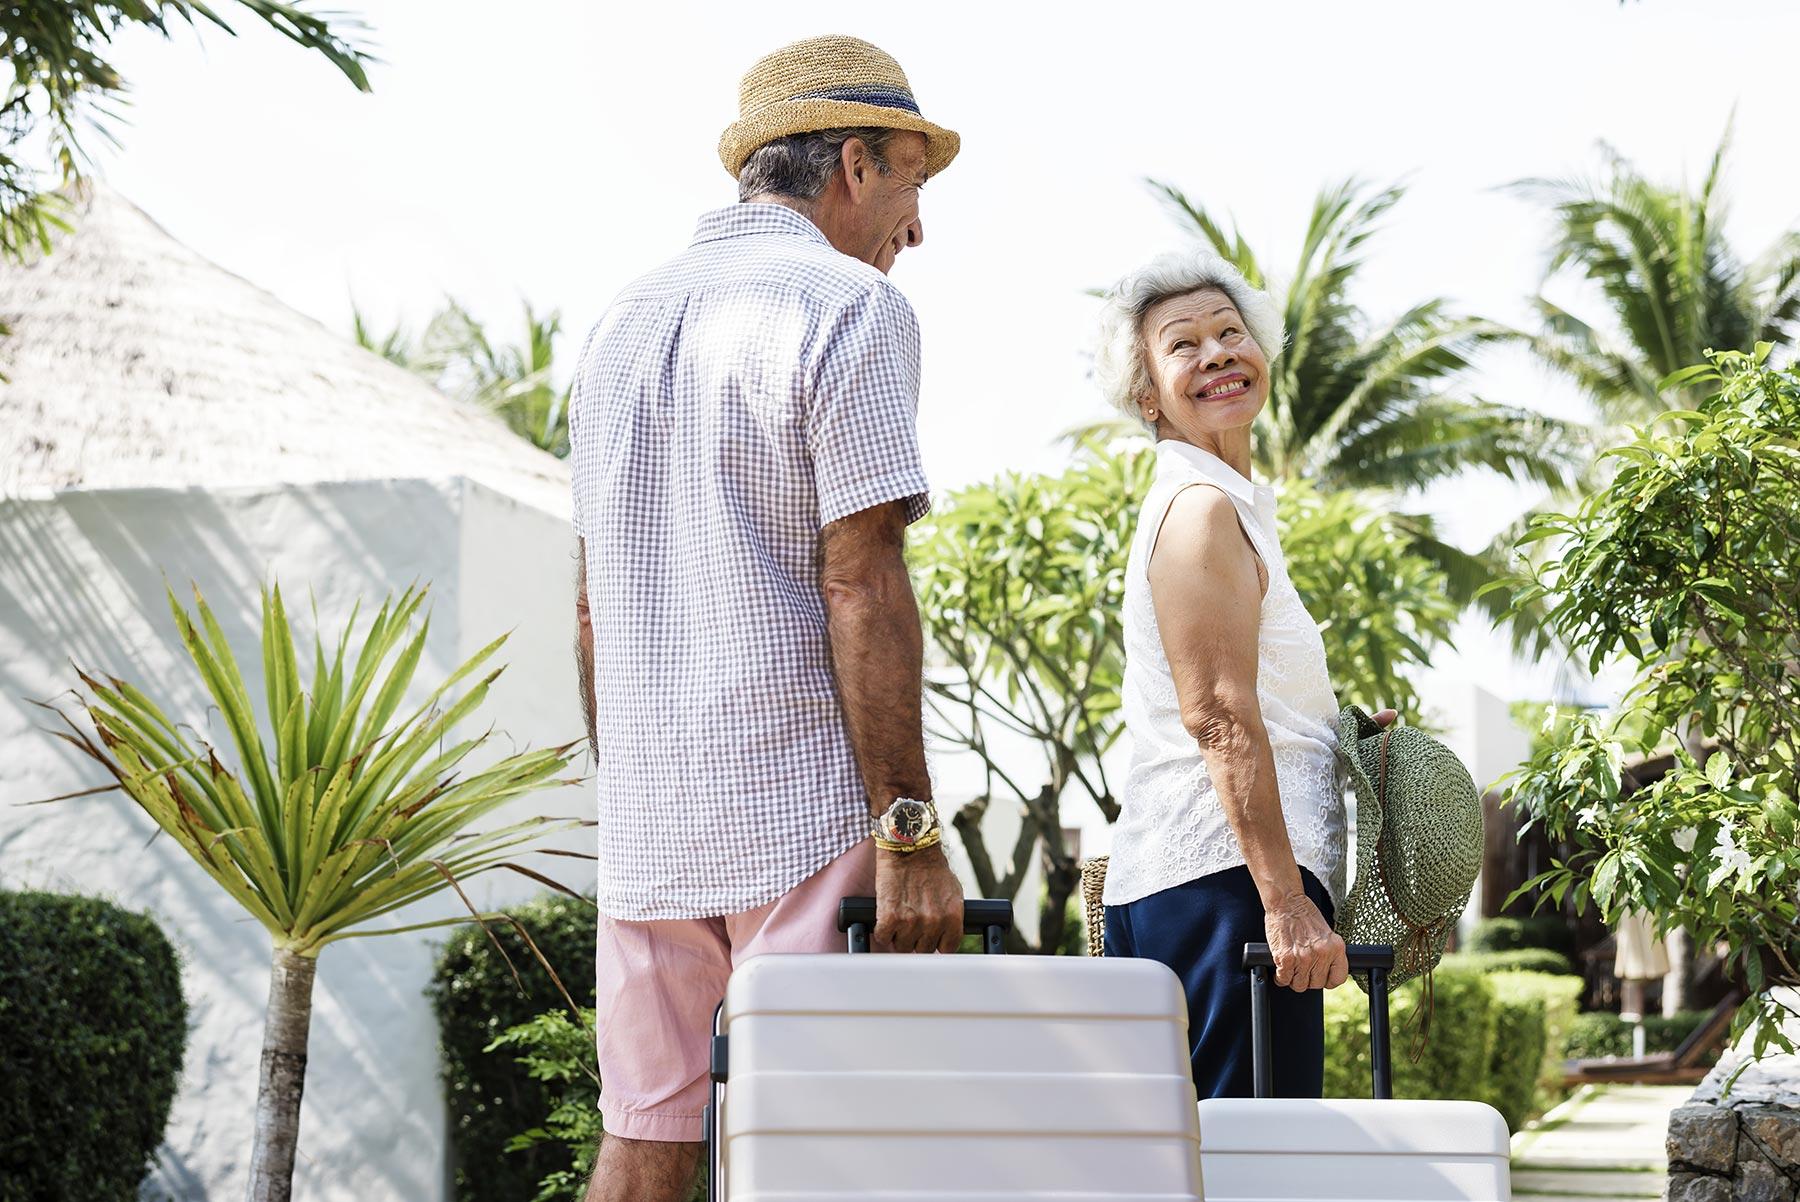 happy-couple-at-a-resort-TYH4WPU.jpg